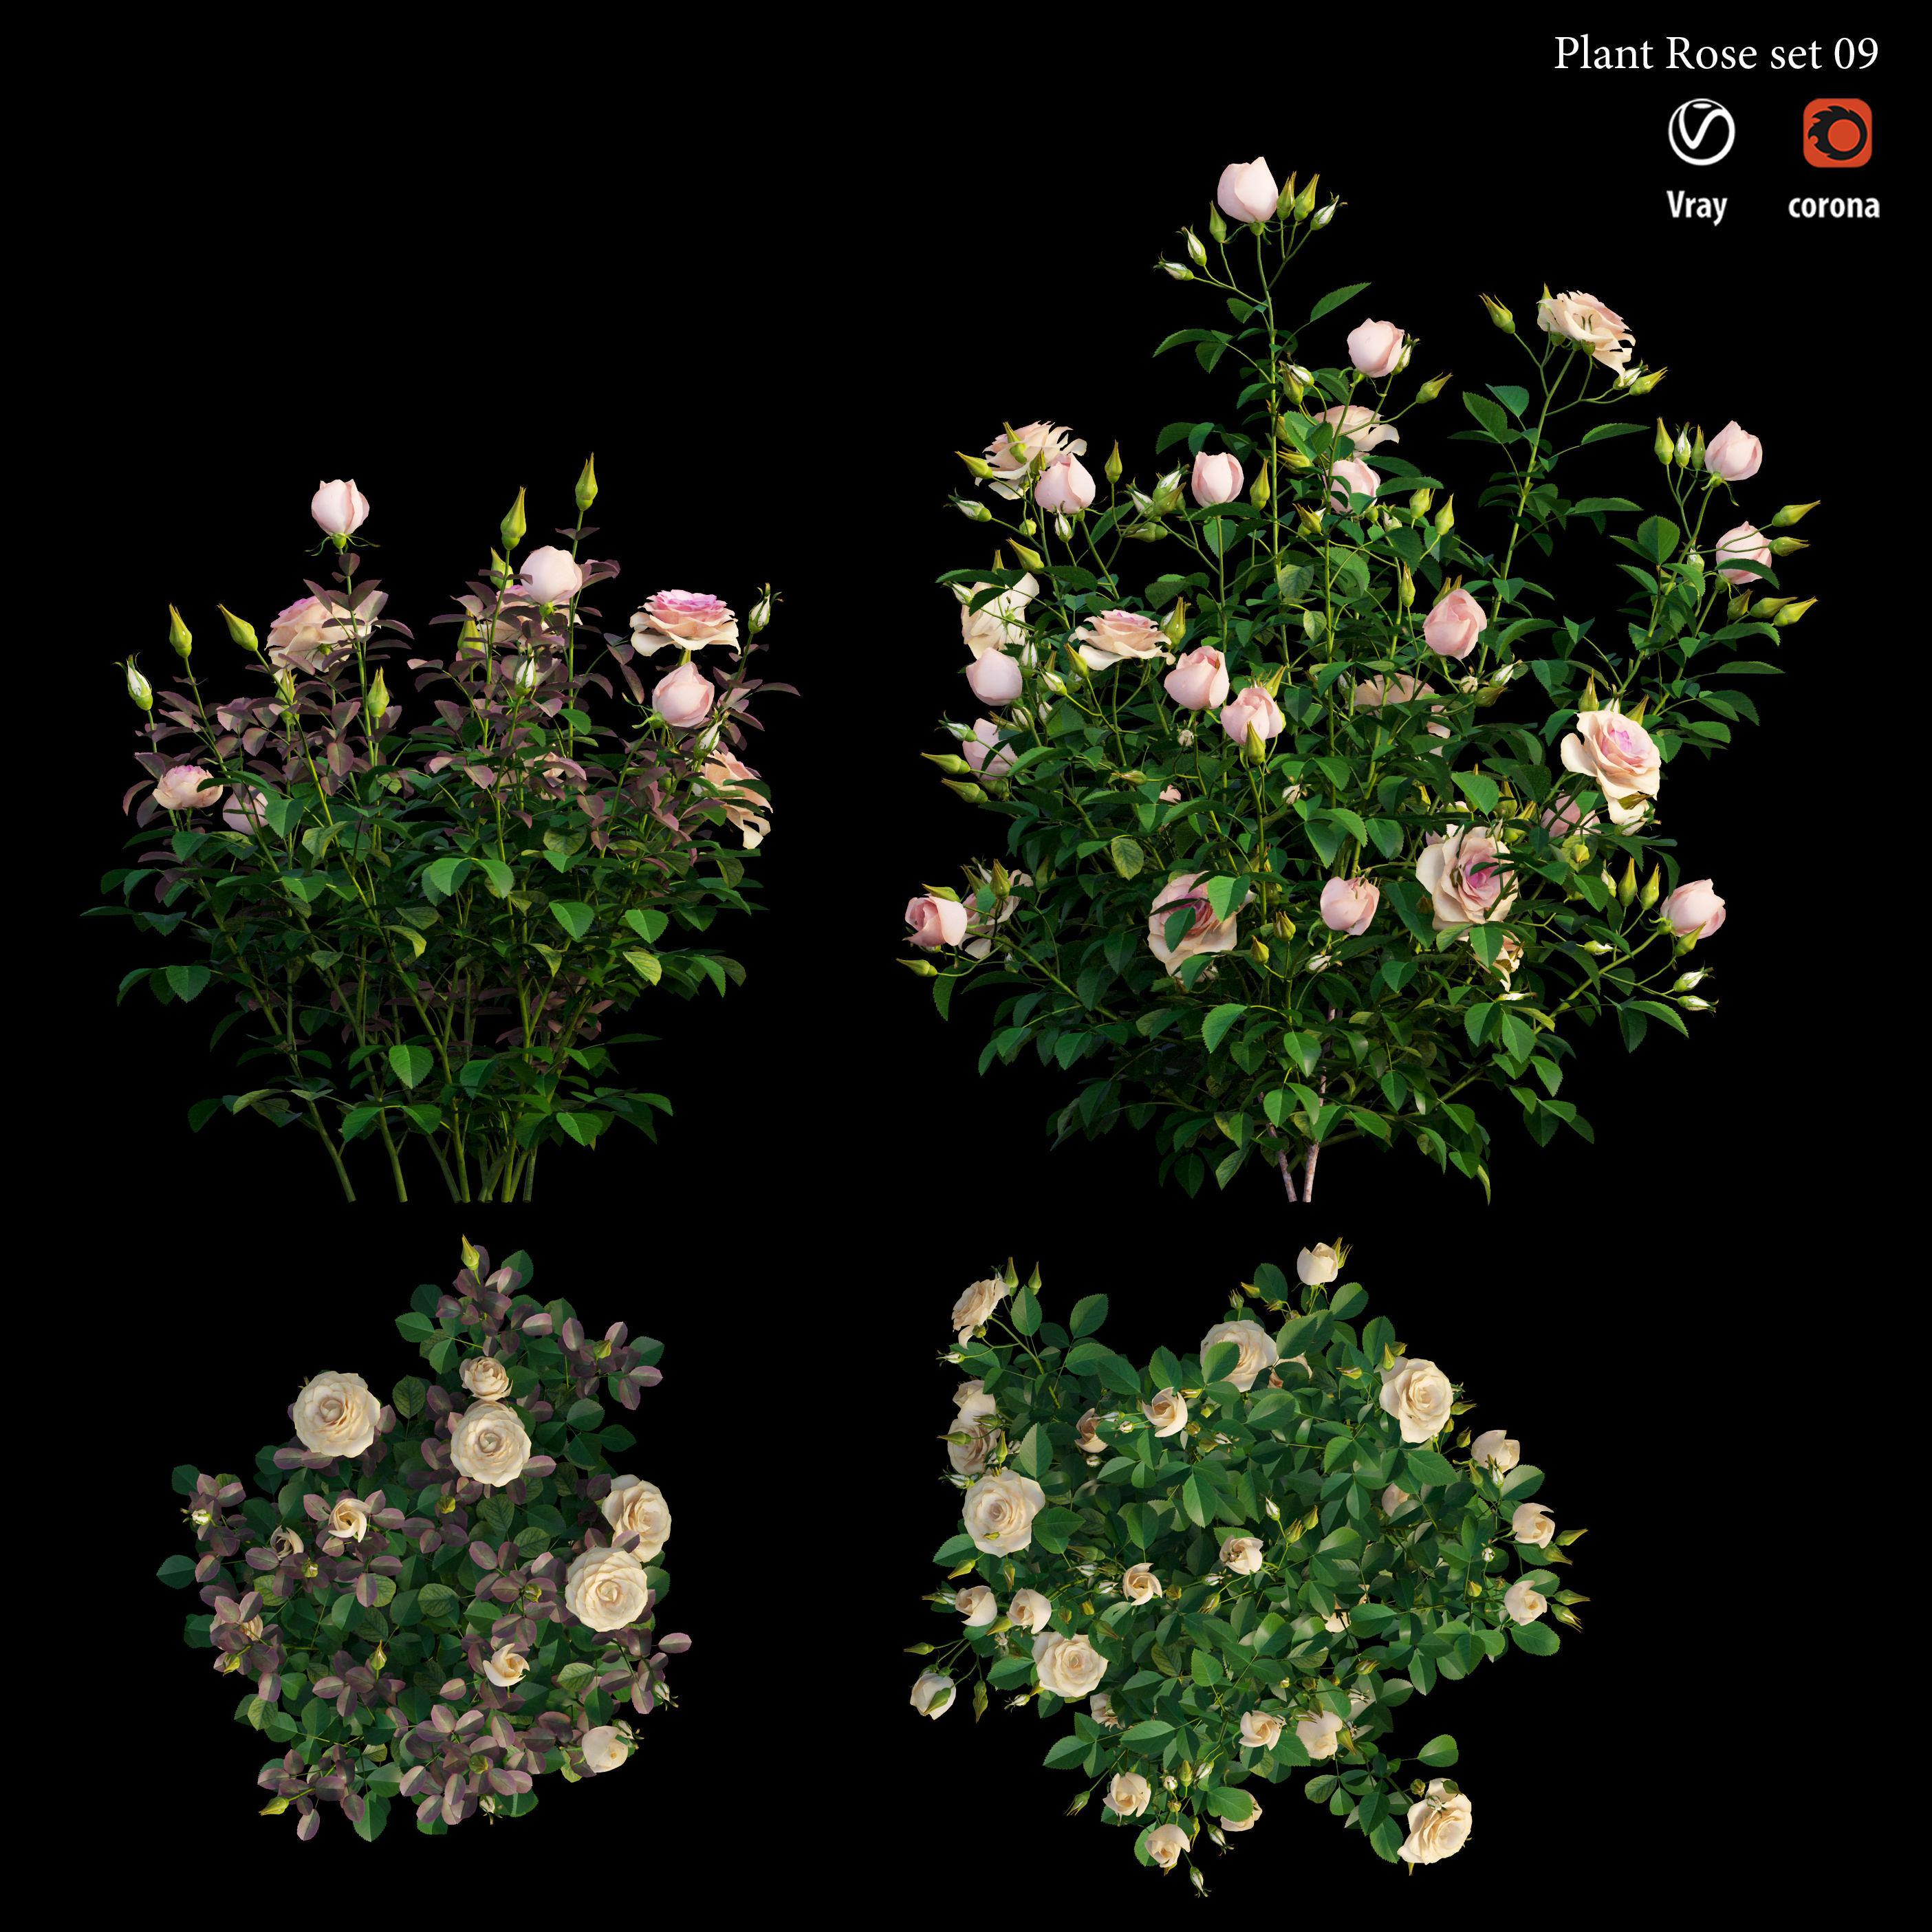 Plant rose set 09